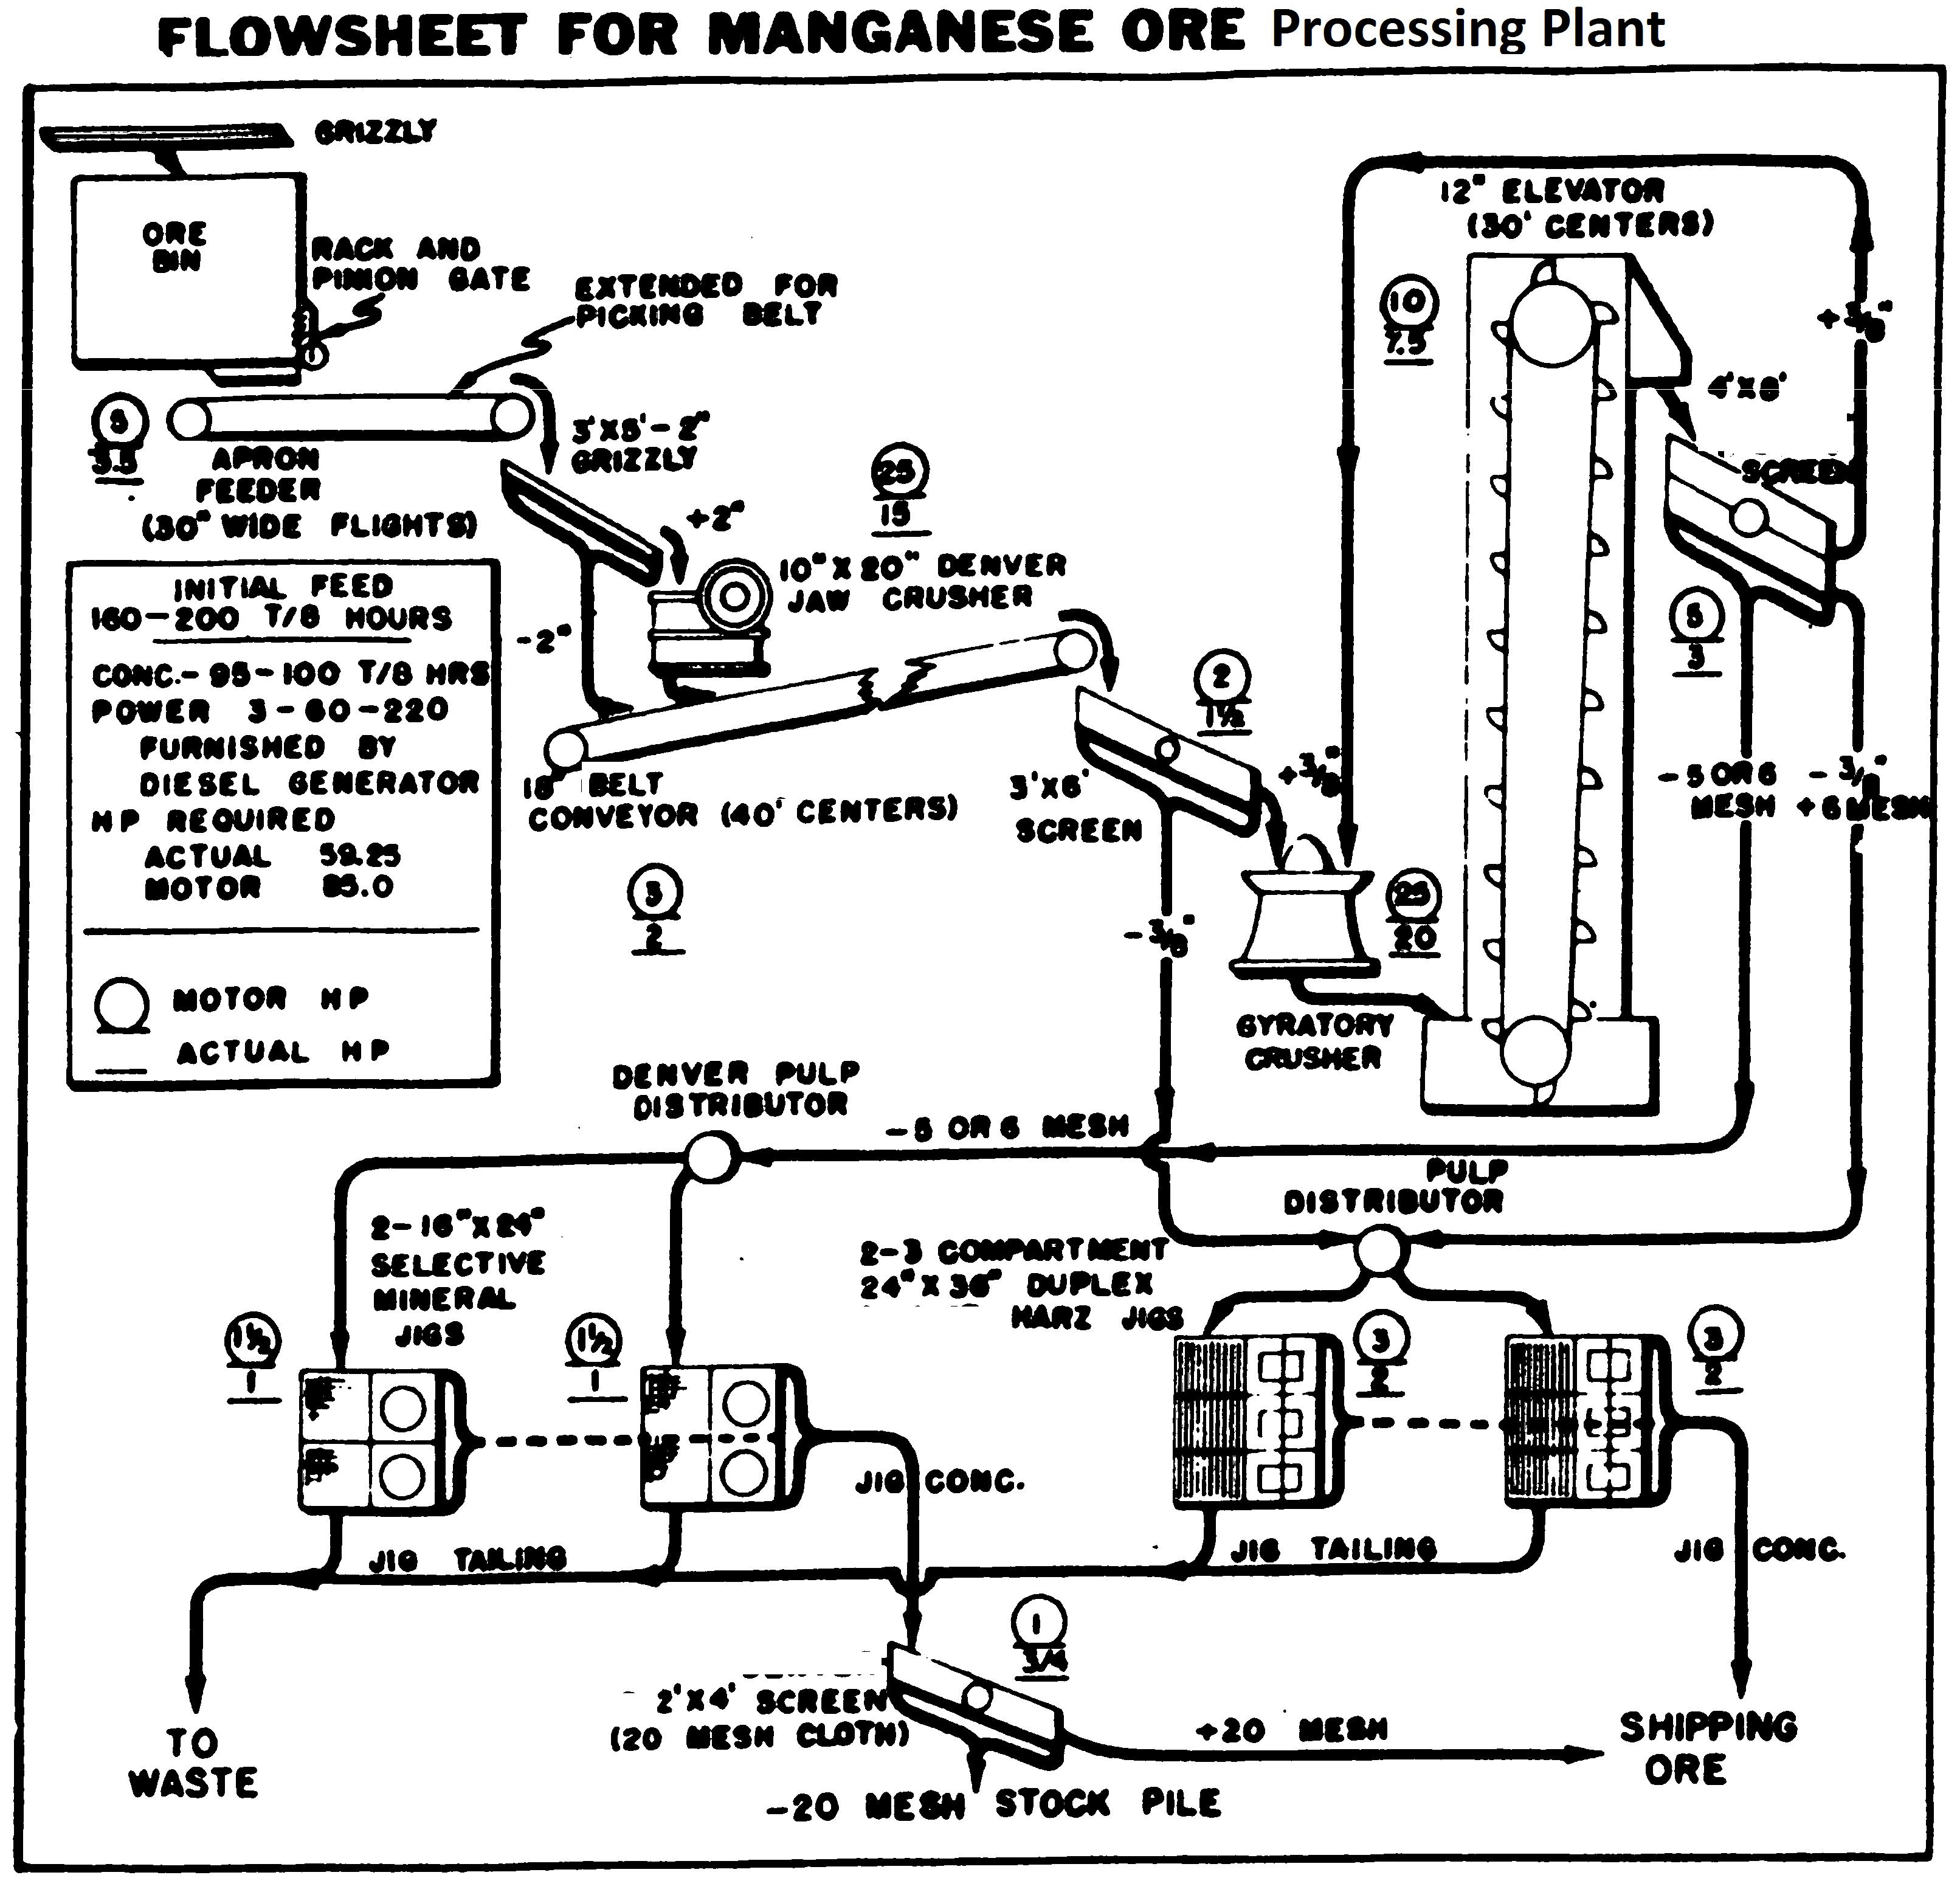 Manganese ore processing plant flowsheet nvjuhfo Image collections